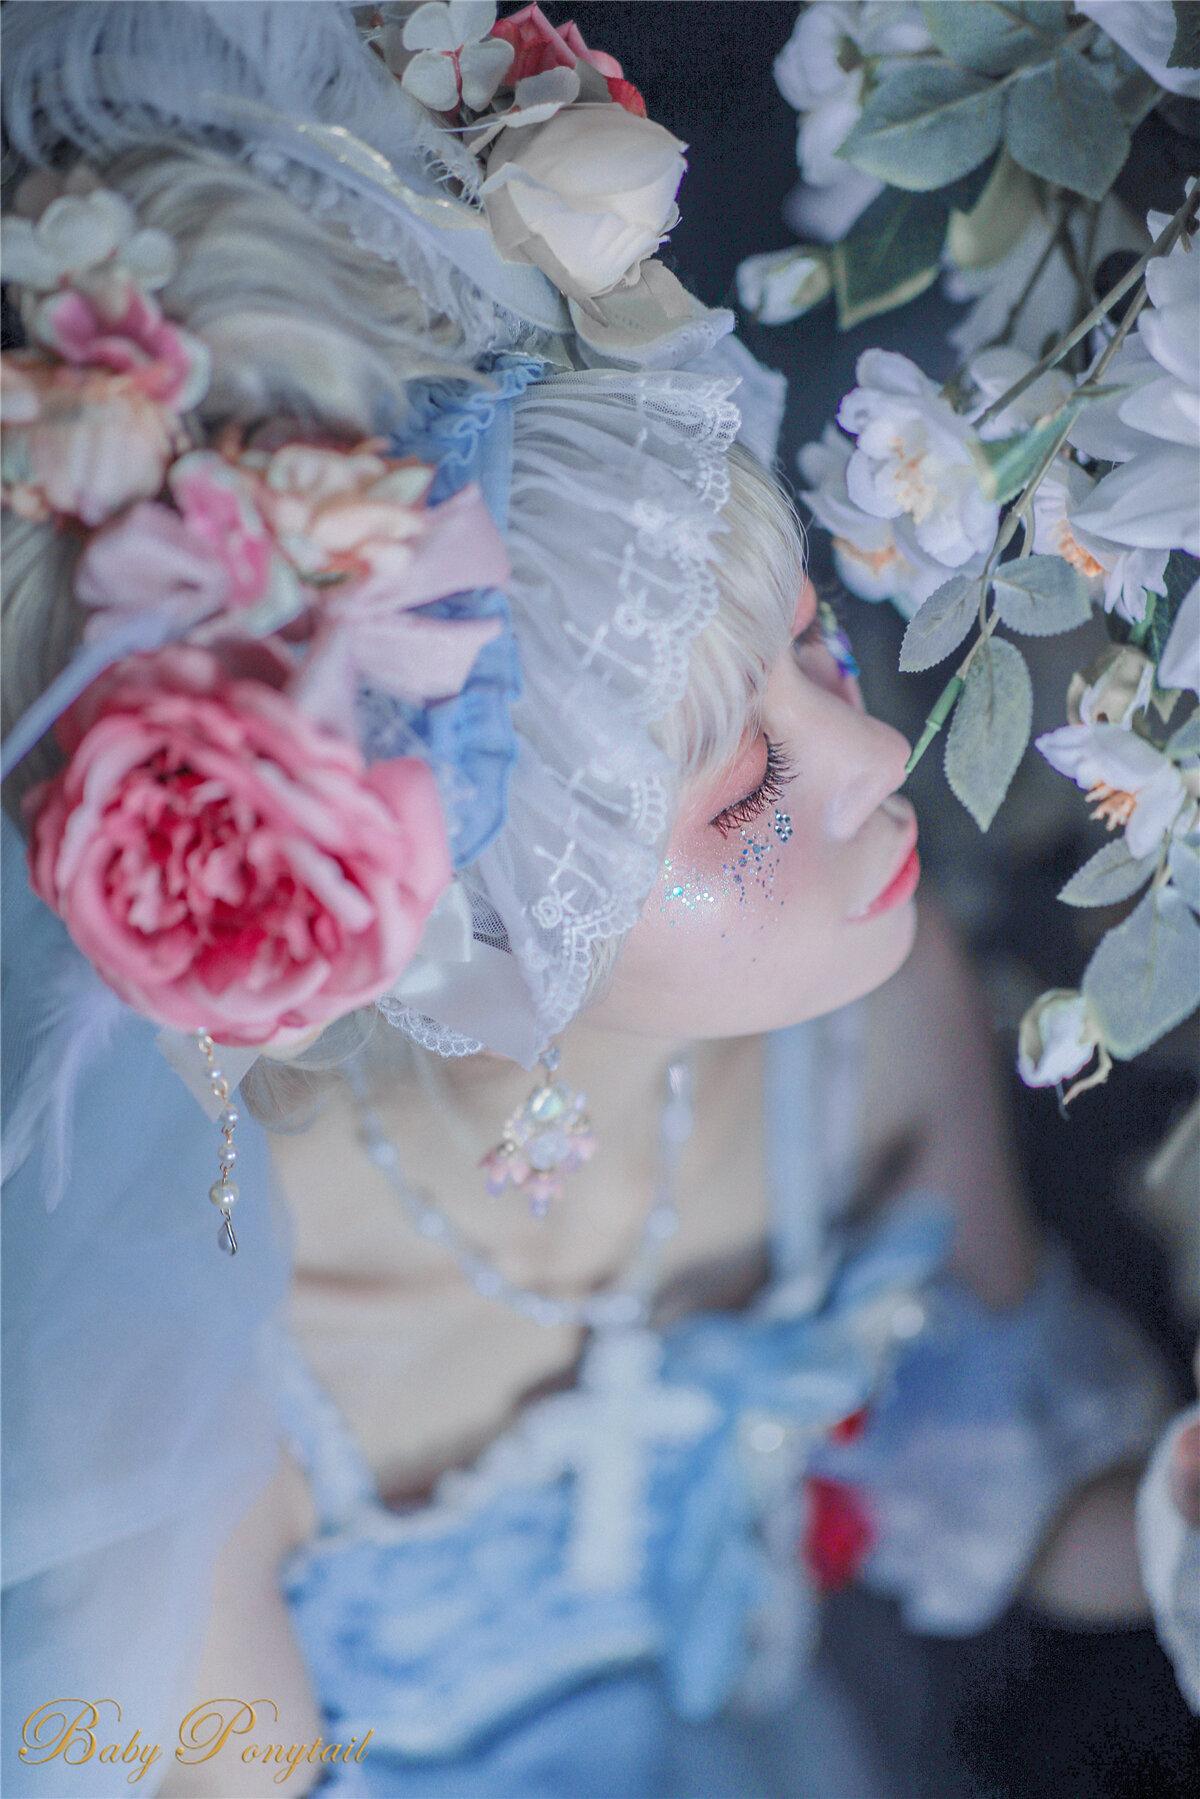 Babyponytail_Heavenly Teardrops_Model photo_JSK SAX_KAKA_13.jpg